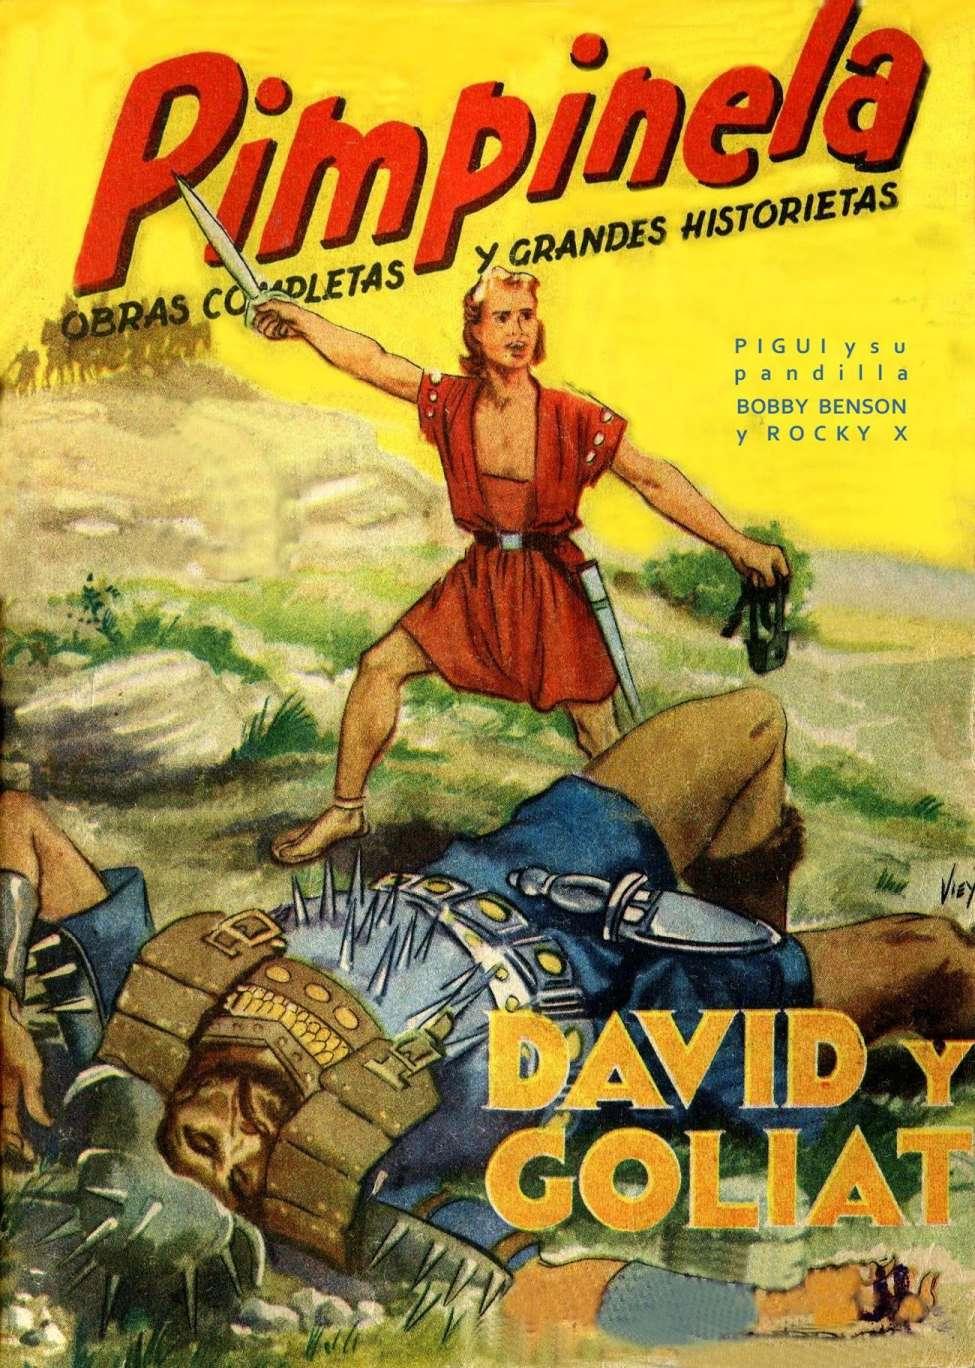 Comic Book Cover For Pimpinela 27 - David y Goliat